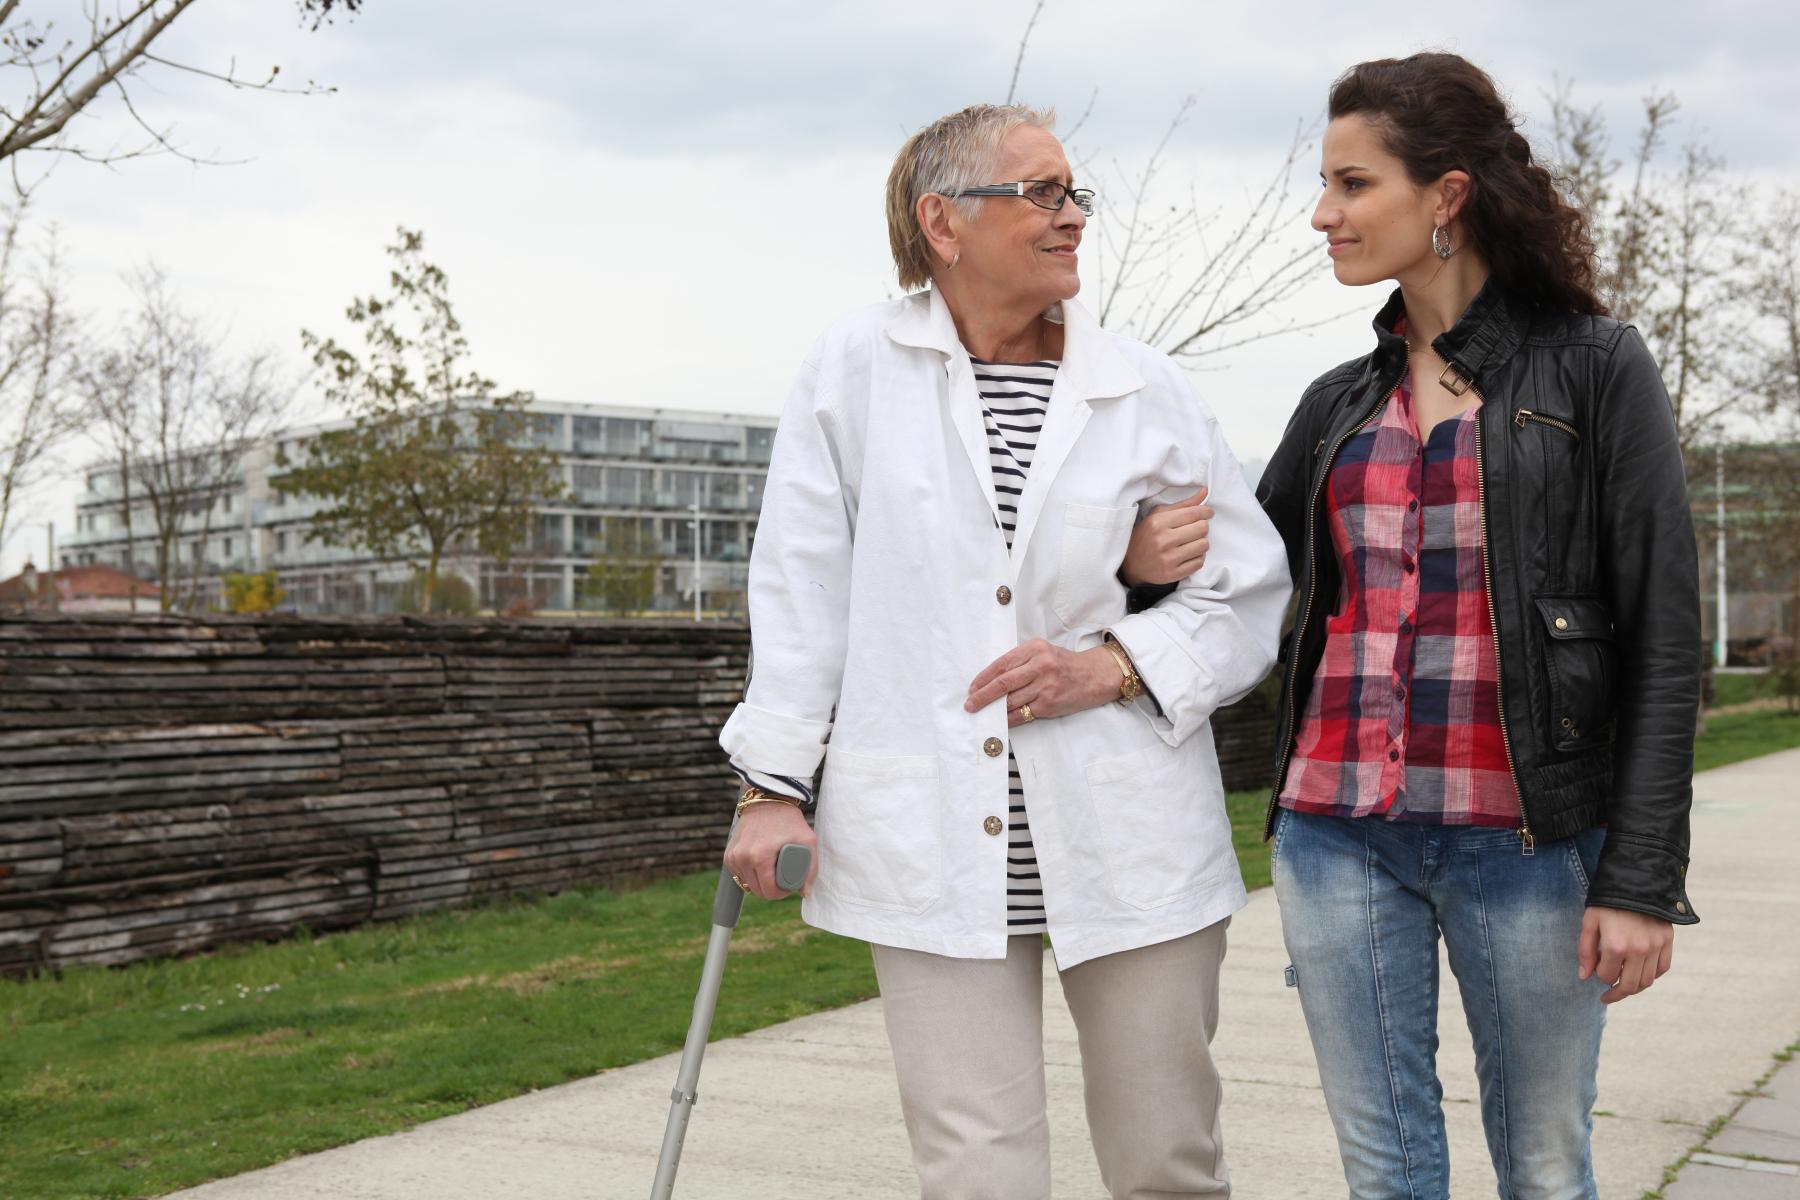 Datter går tur med dement mor